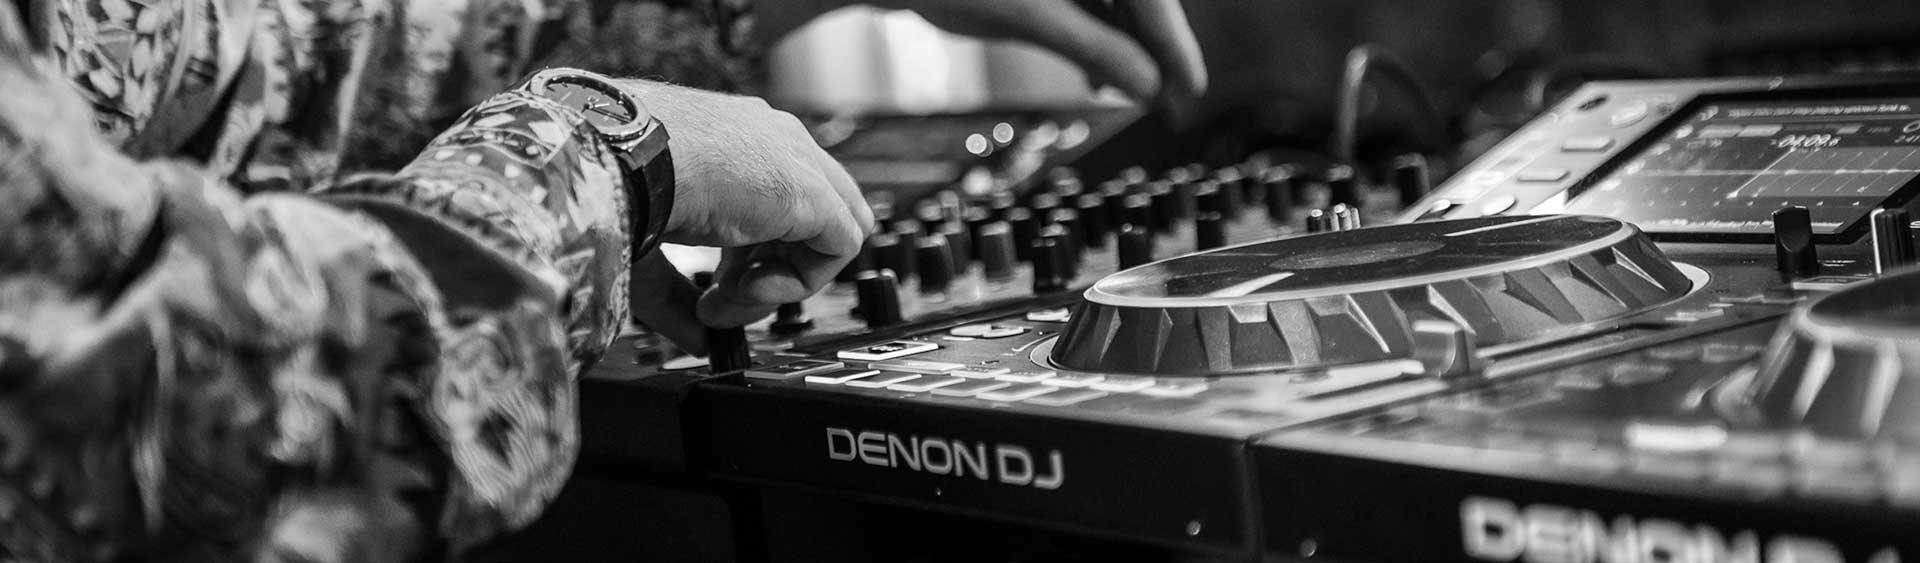 DJ-Player